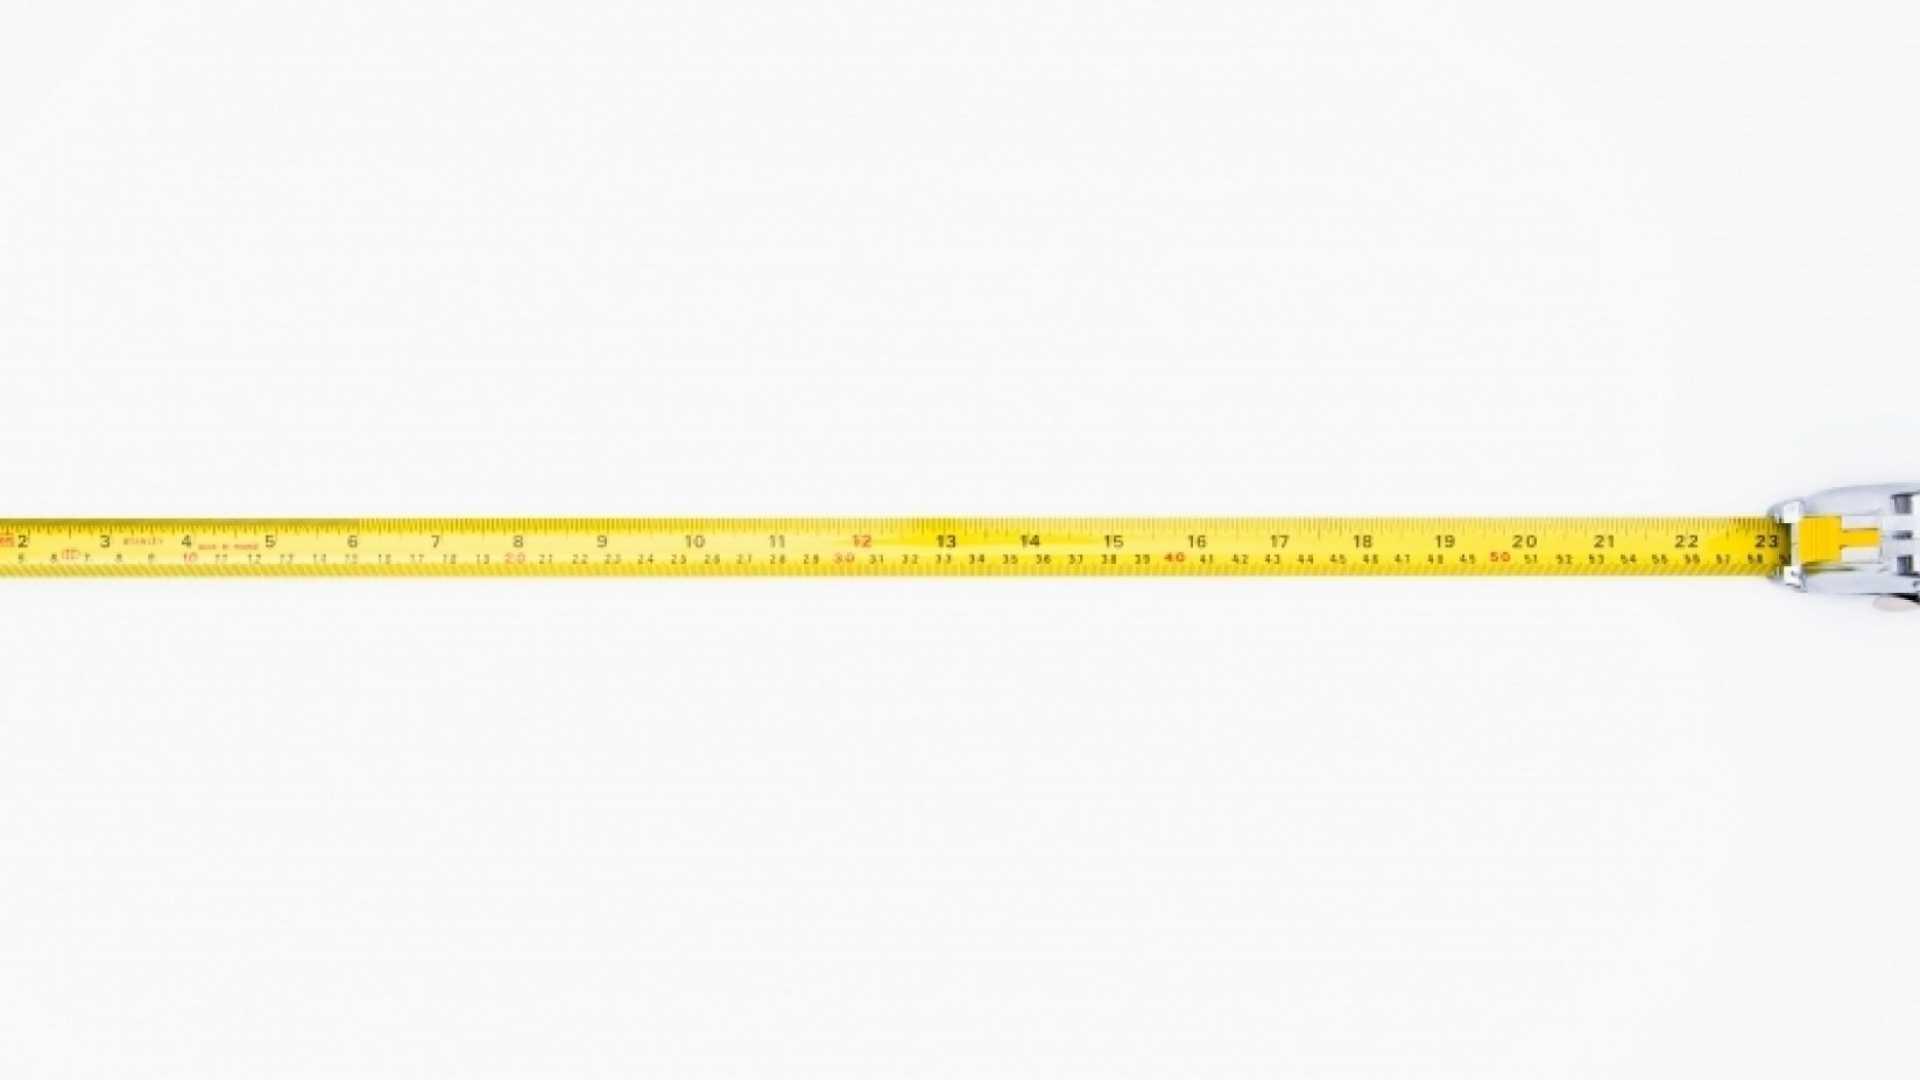 4 Proven Metrics to Measure Your Sales Development Team's Performance